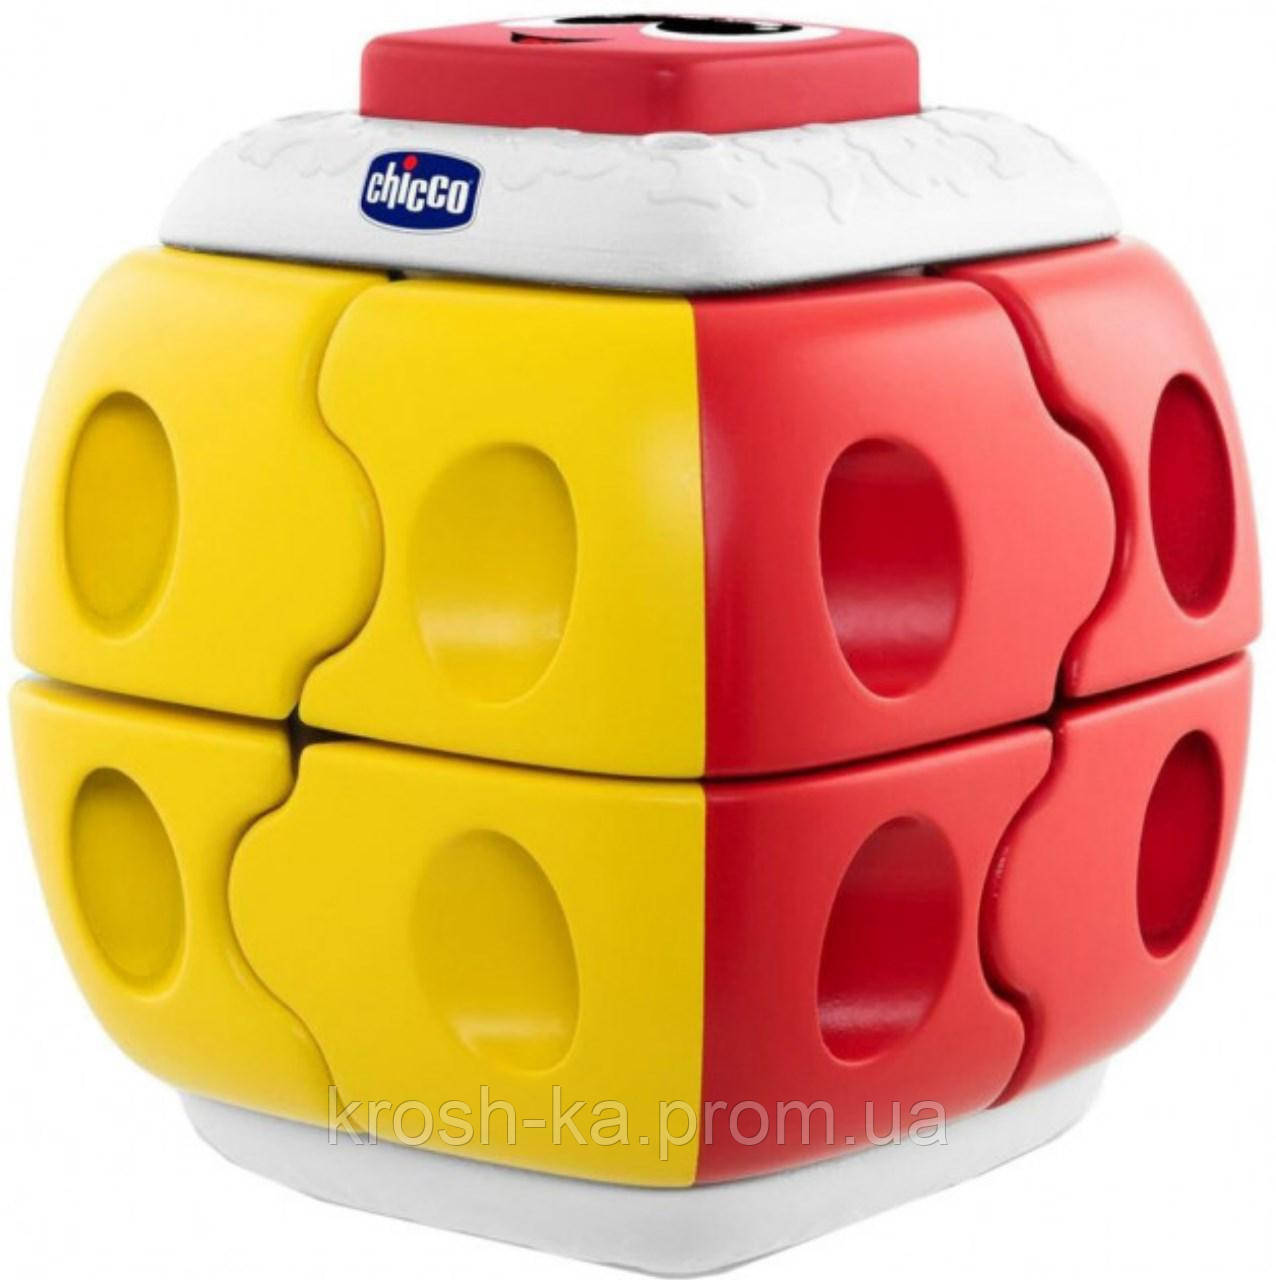 Игрушка конструктор Куб 2в1 Chicco Italy 10061.00